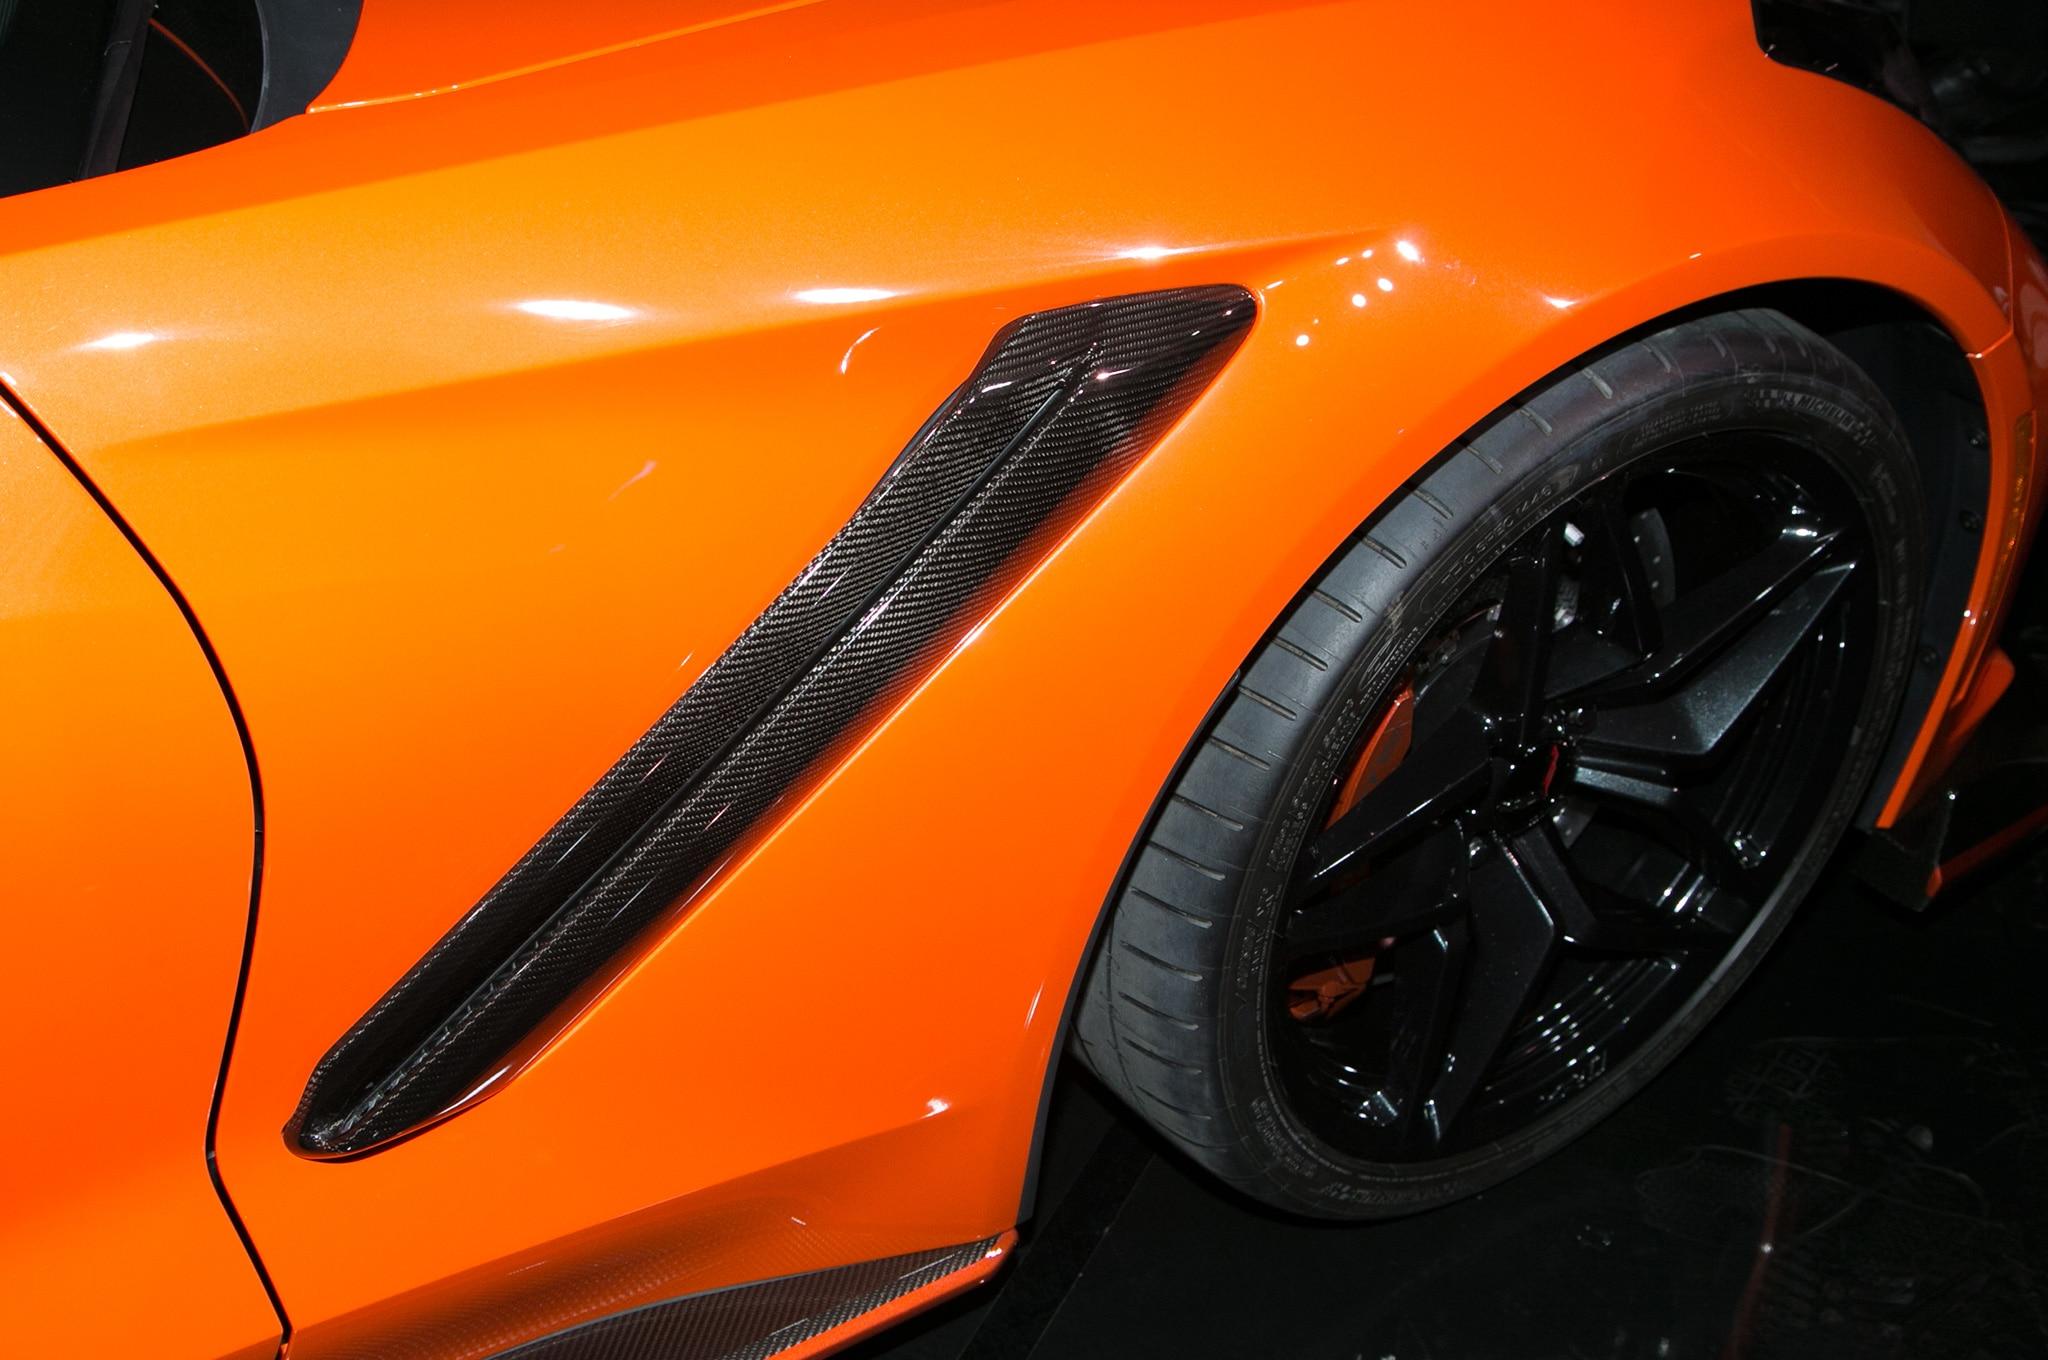 2019 chevrolet corvette zr1 convertible drops top in l a automobile magazine. Black Bedroom Furniture Sets. Home Design Ideas